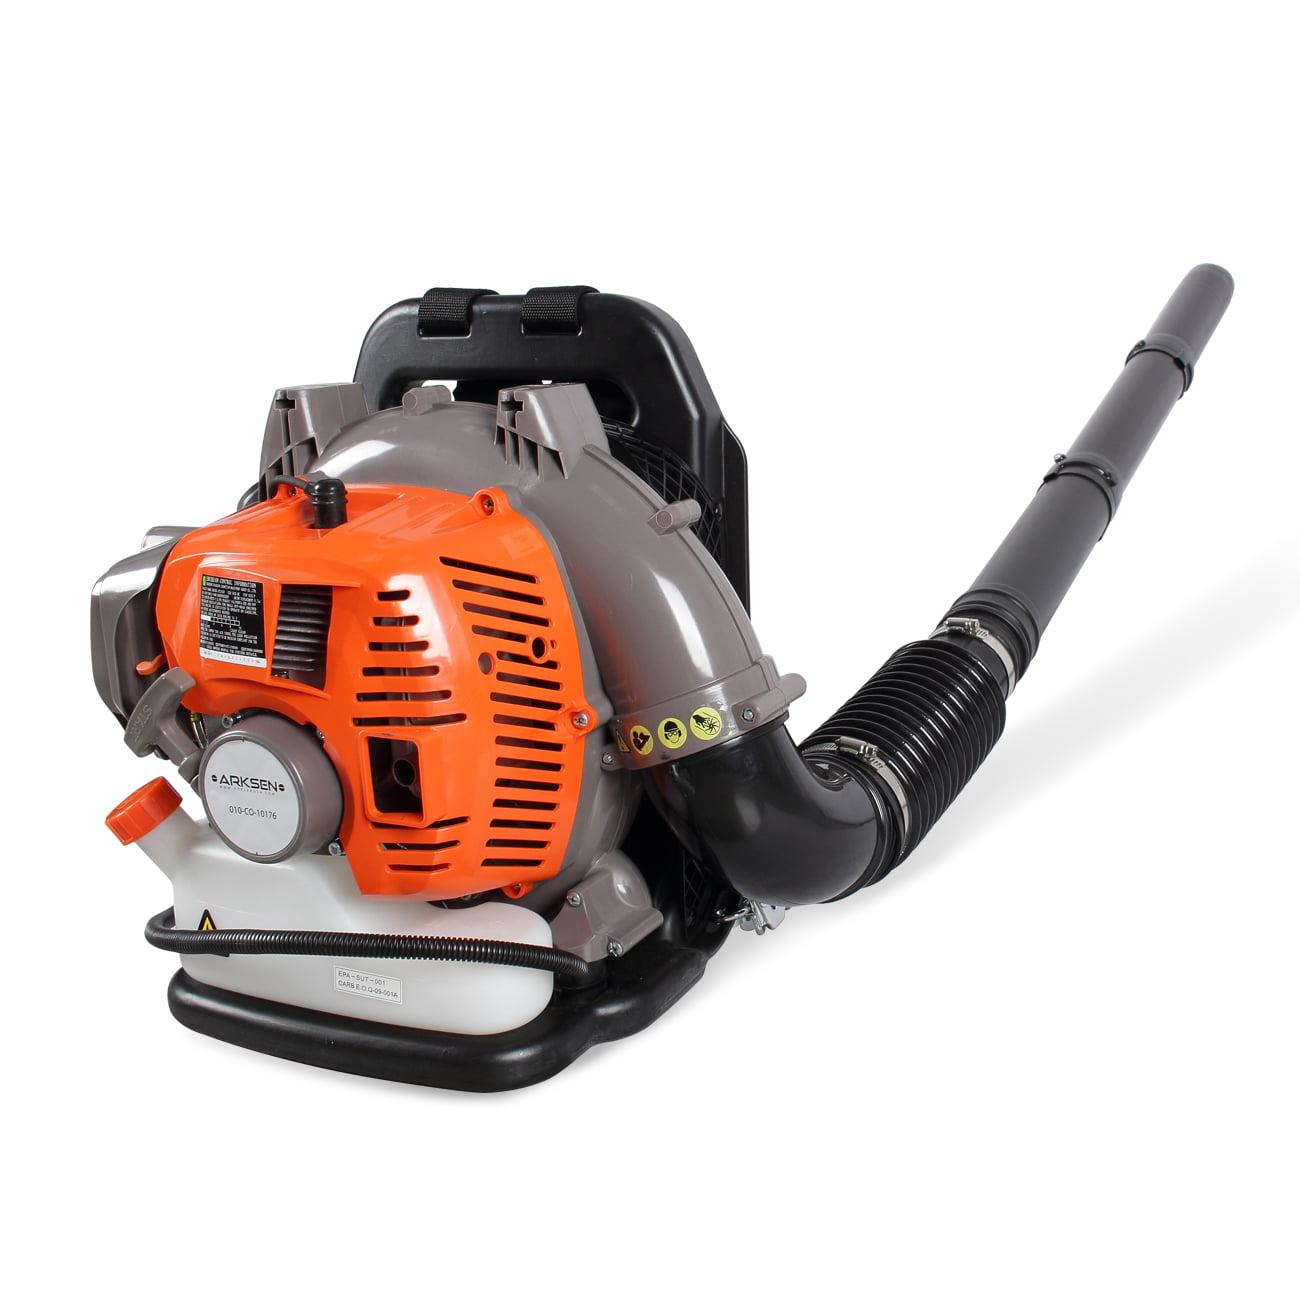 ARKSEN 52CC Gasoline Leaf Blower Backpack Garden 2-Cycle Gas Debris Duster Outdoor Backyard 2-Stroke Powered EPA